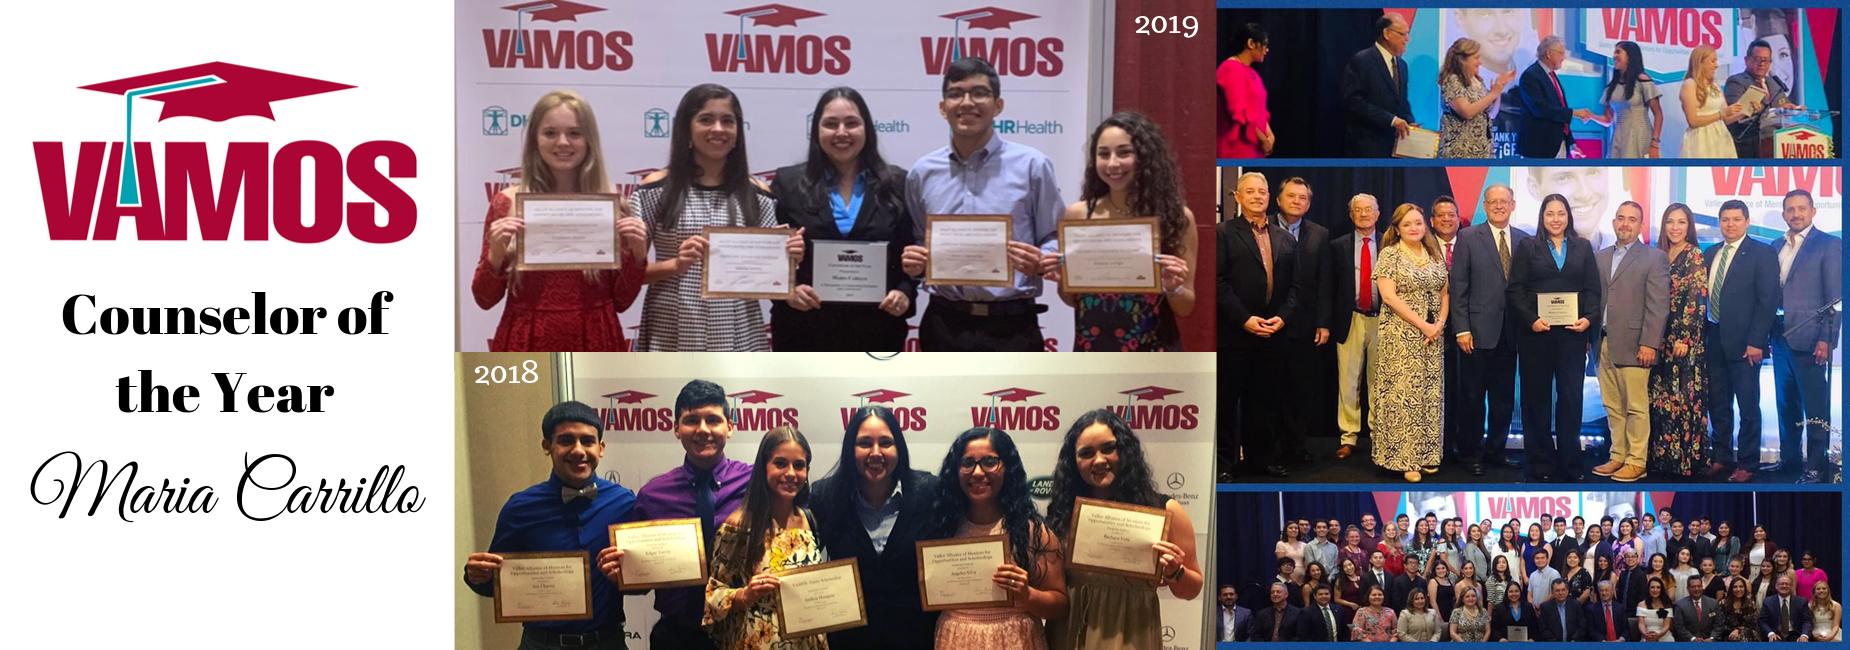 students receiving VAMOS scholarship awards